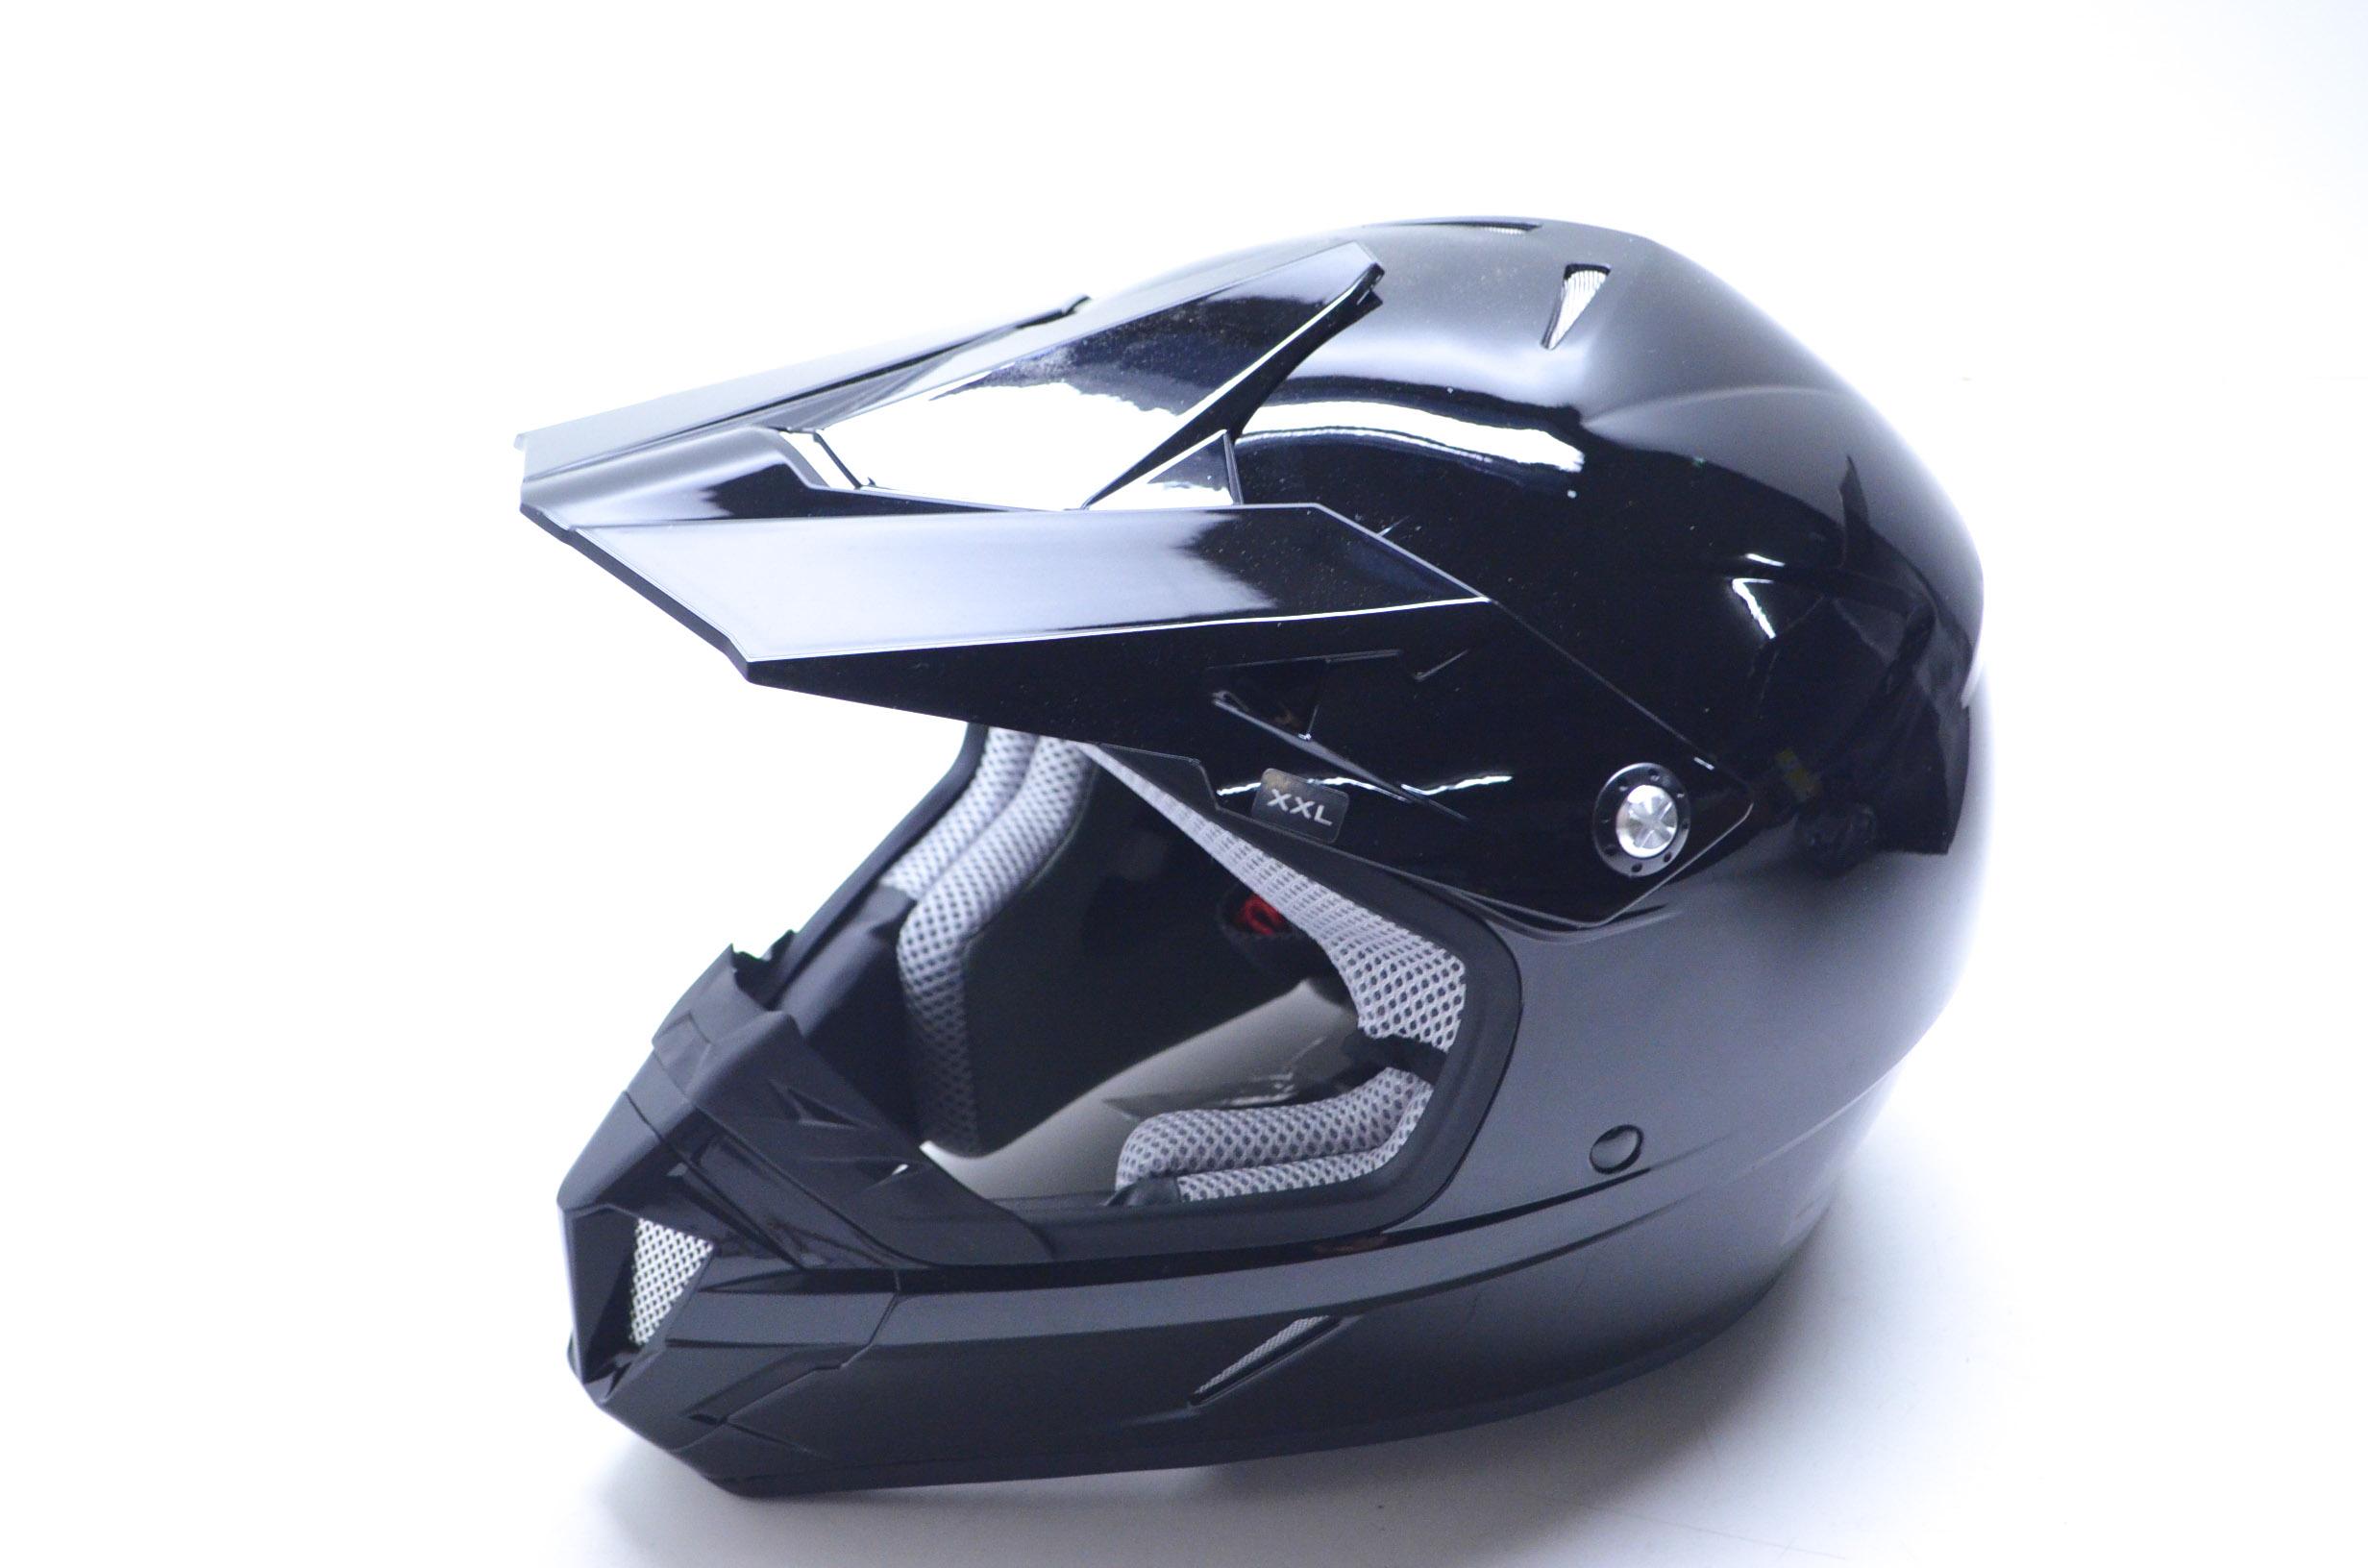 Can-Am, Sea-Doo, Ski-Doo 4482501490 Ski-Doo Black XXL XC-4 Cross Helmet QTY 1 by Can-Am, Sea-Doo, Ski-Doo